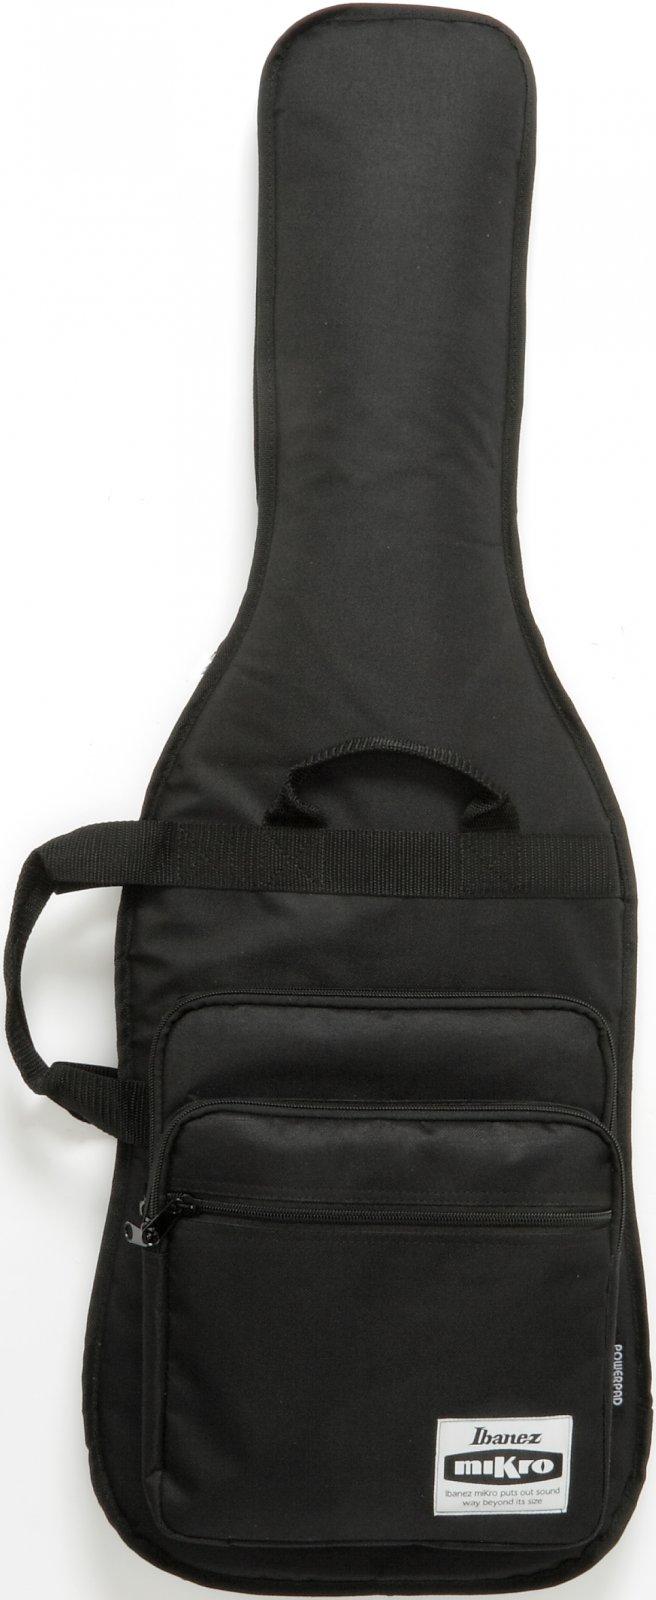 Gig bag for miKro El. Guitar